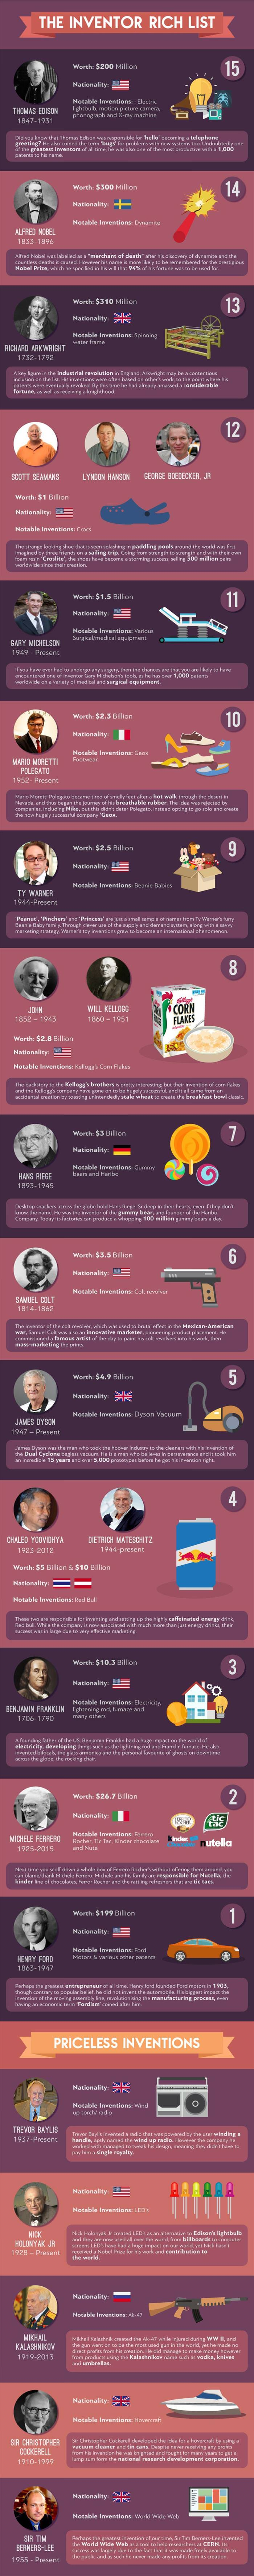 Richest Inventors